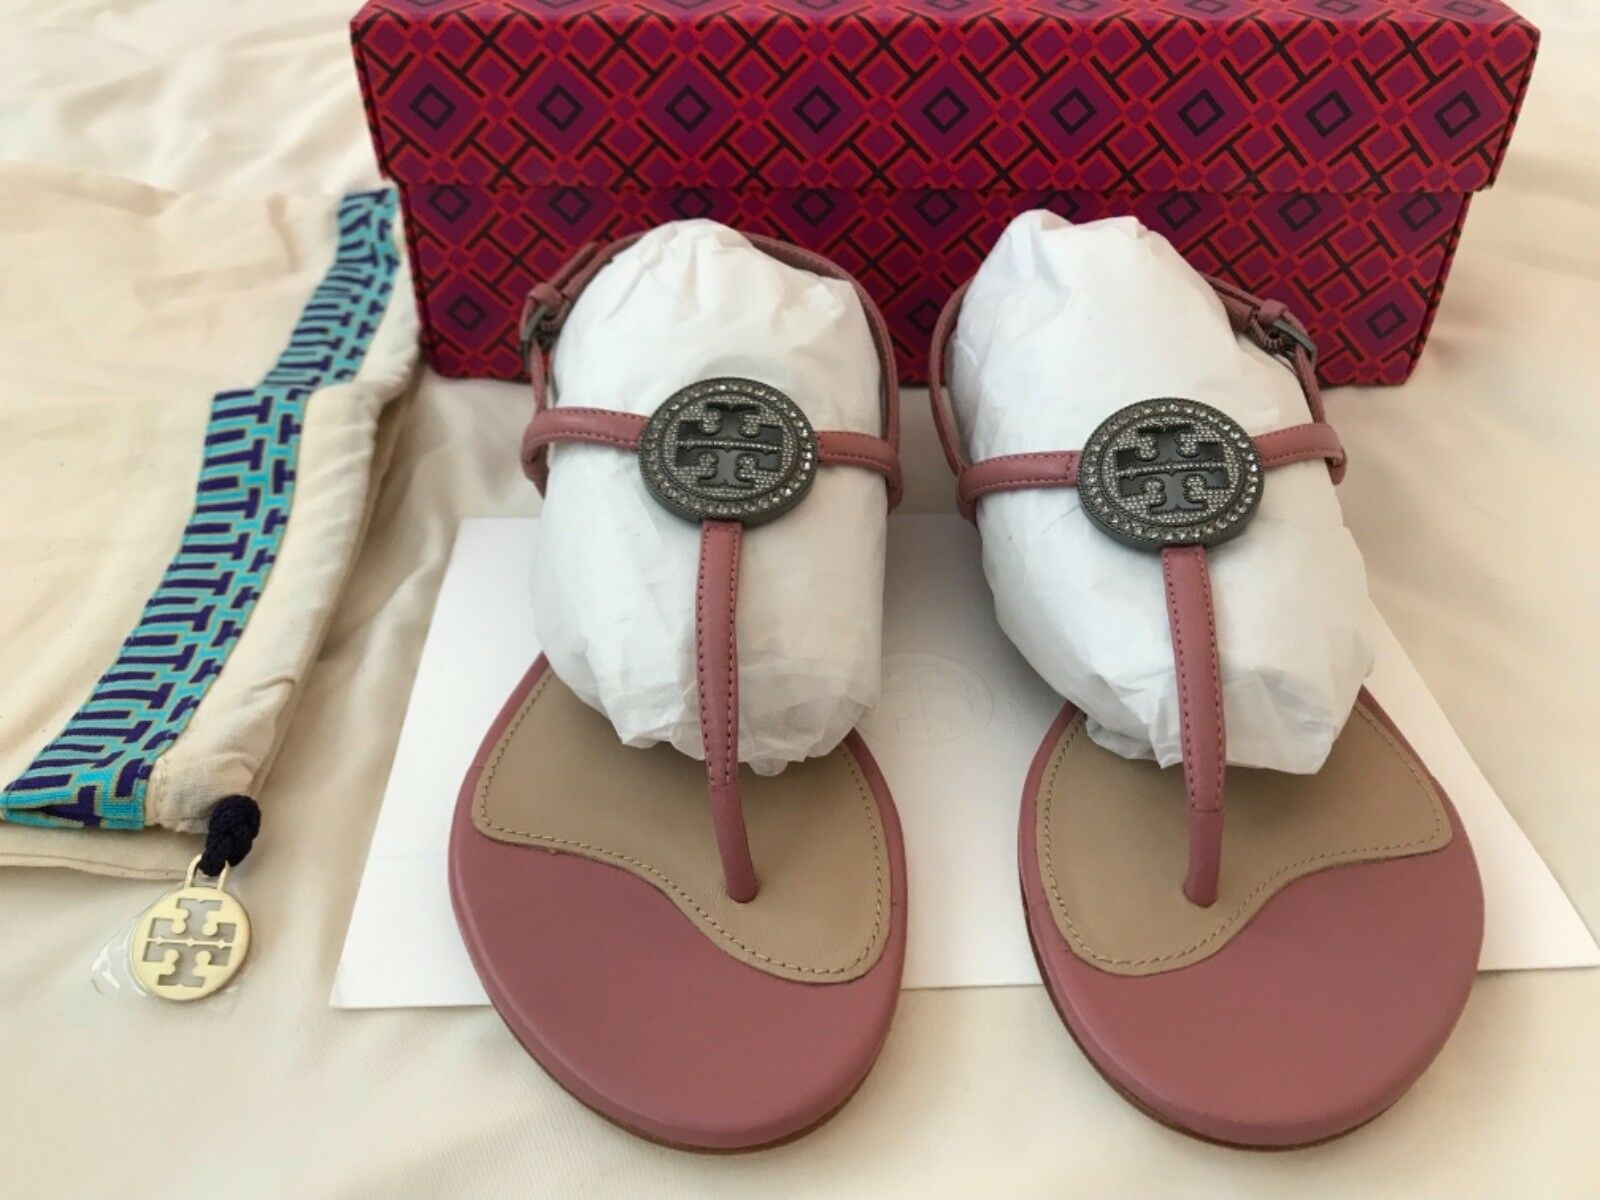 Tory Burch Liana Flat Flat Flat Sandals Magnolia Size 6 49907e